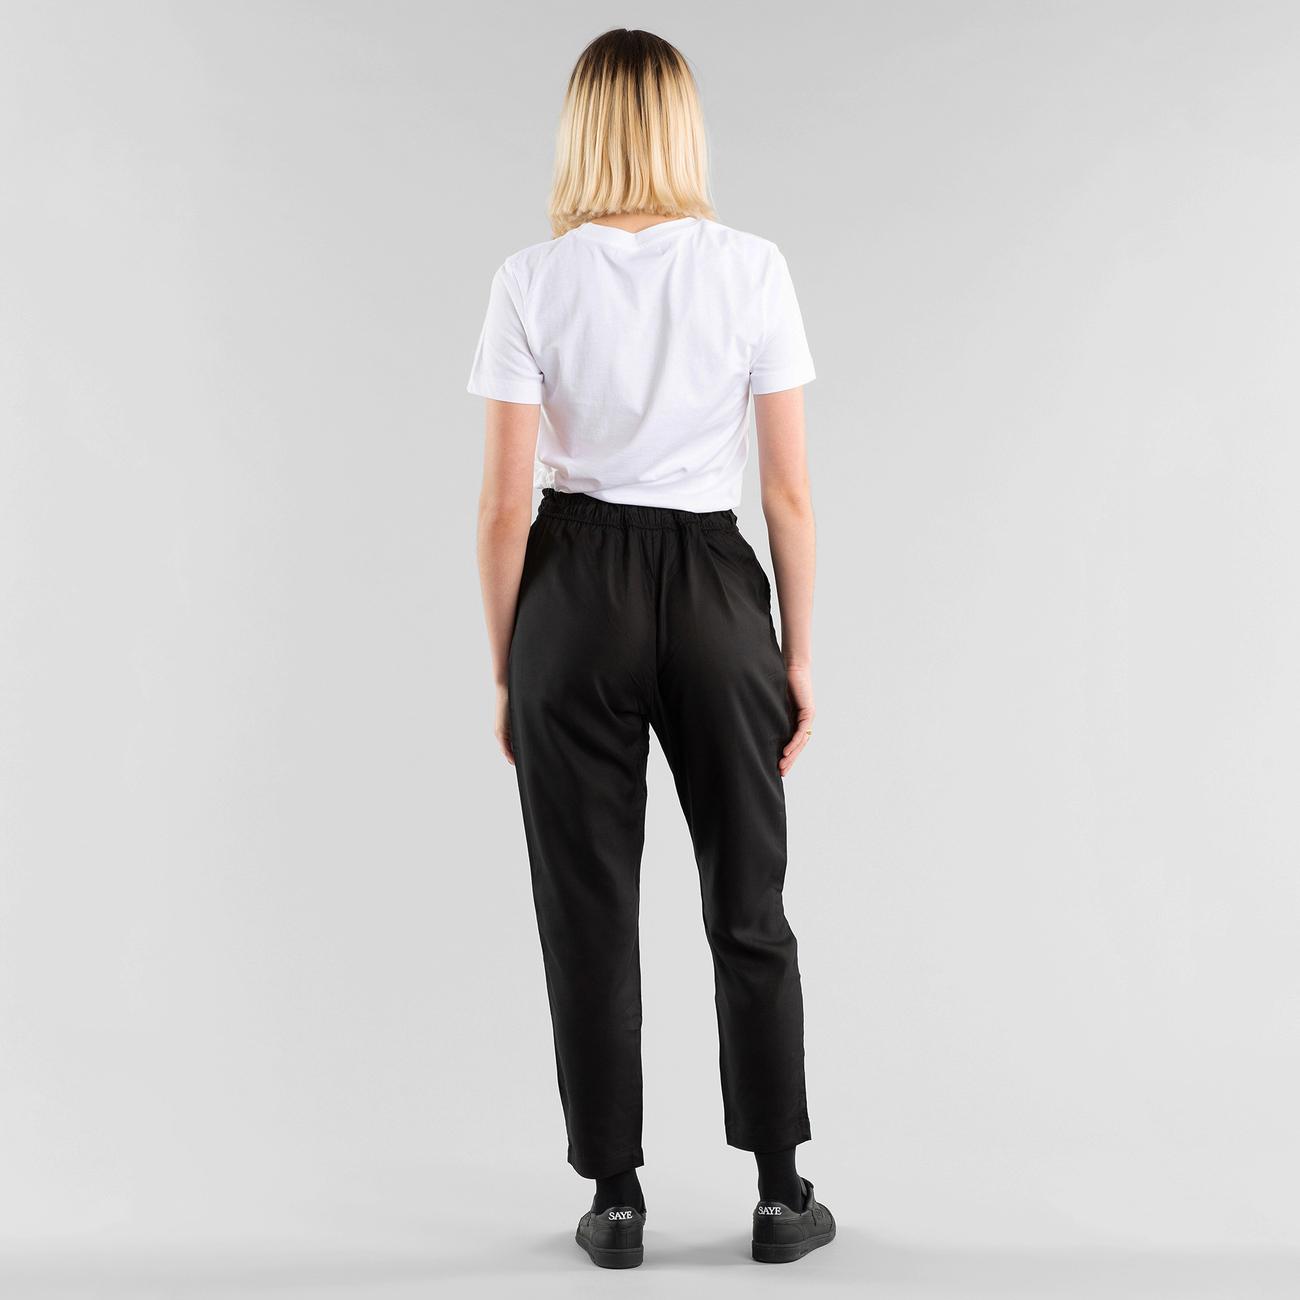 Pants Skagen Black